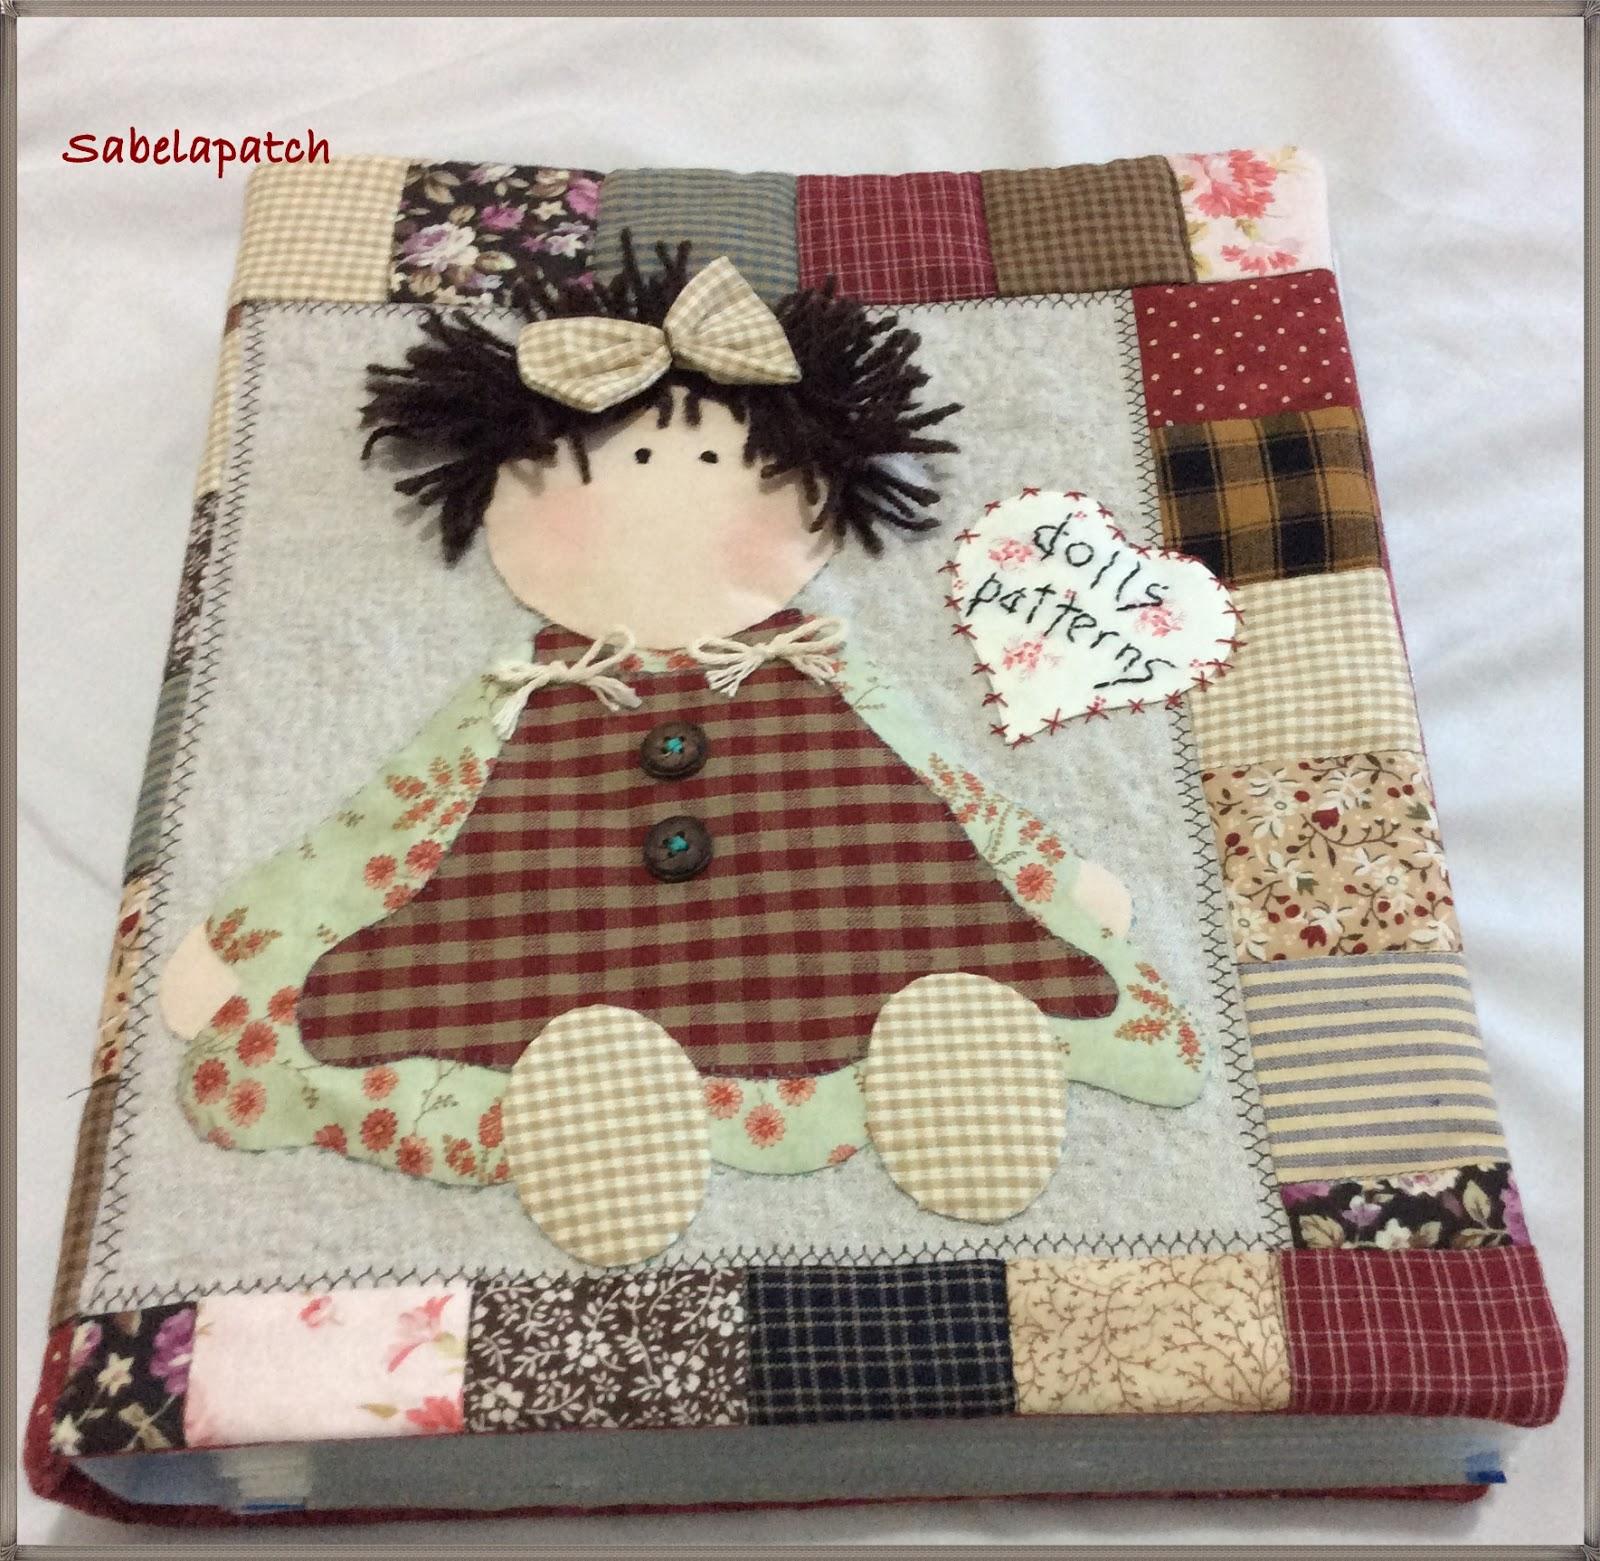 Sabela patchwork funda carpeta de patrones - Como hacer pachwork ...